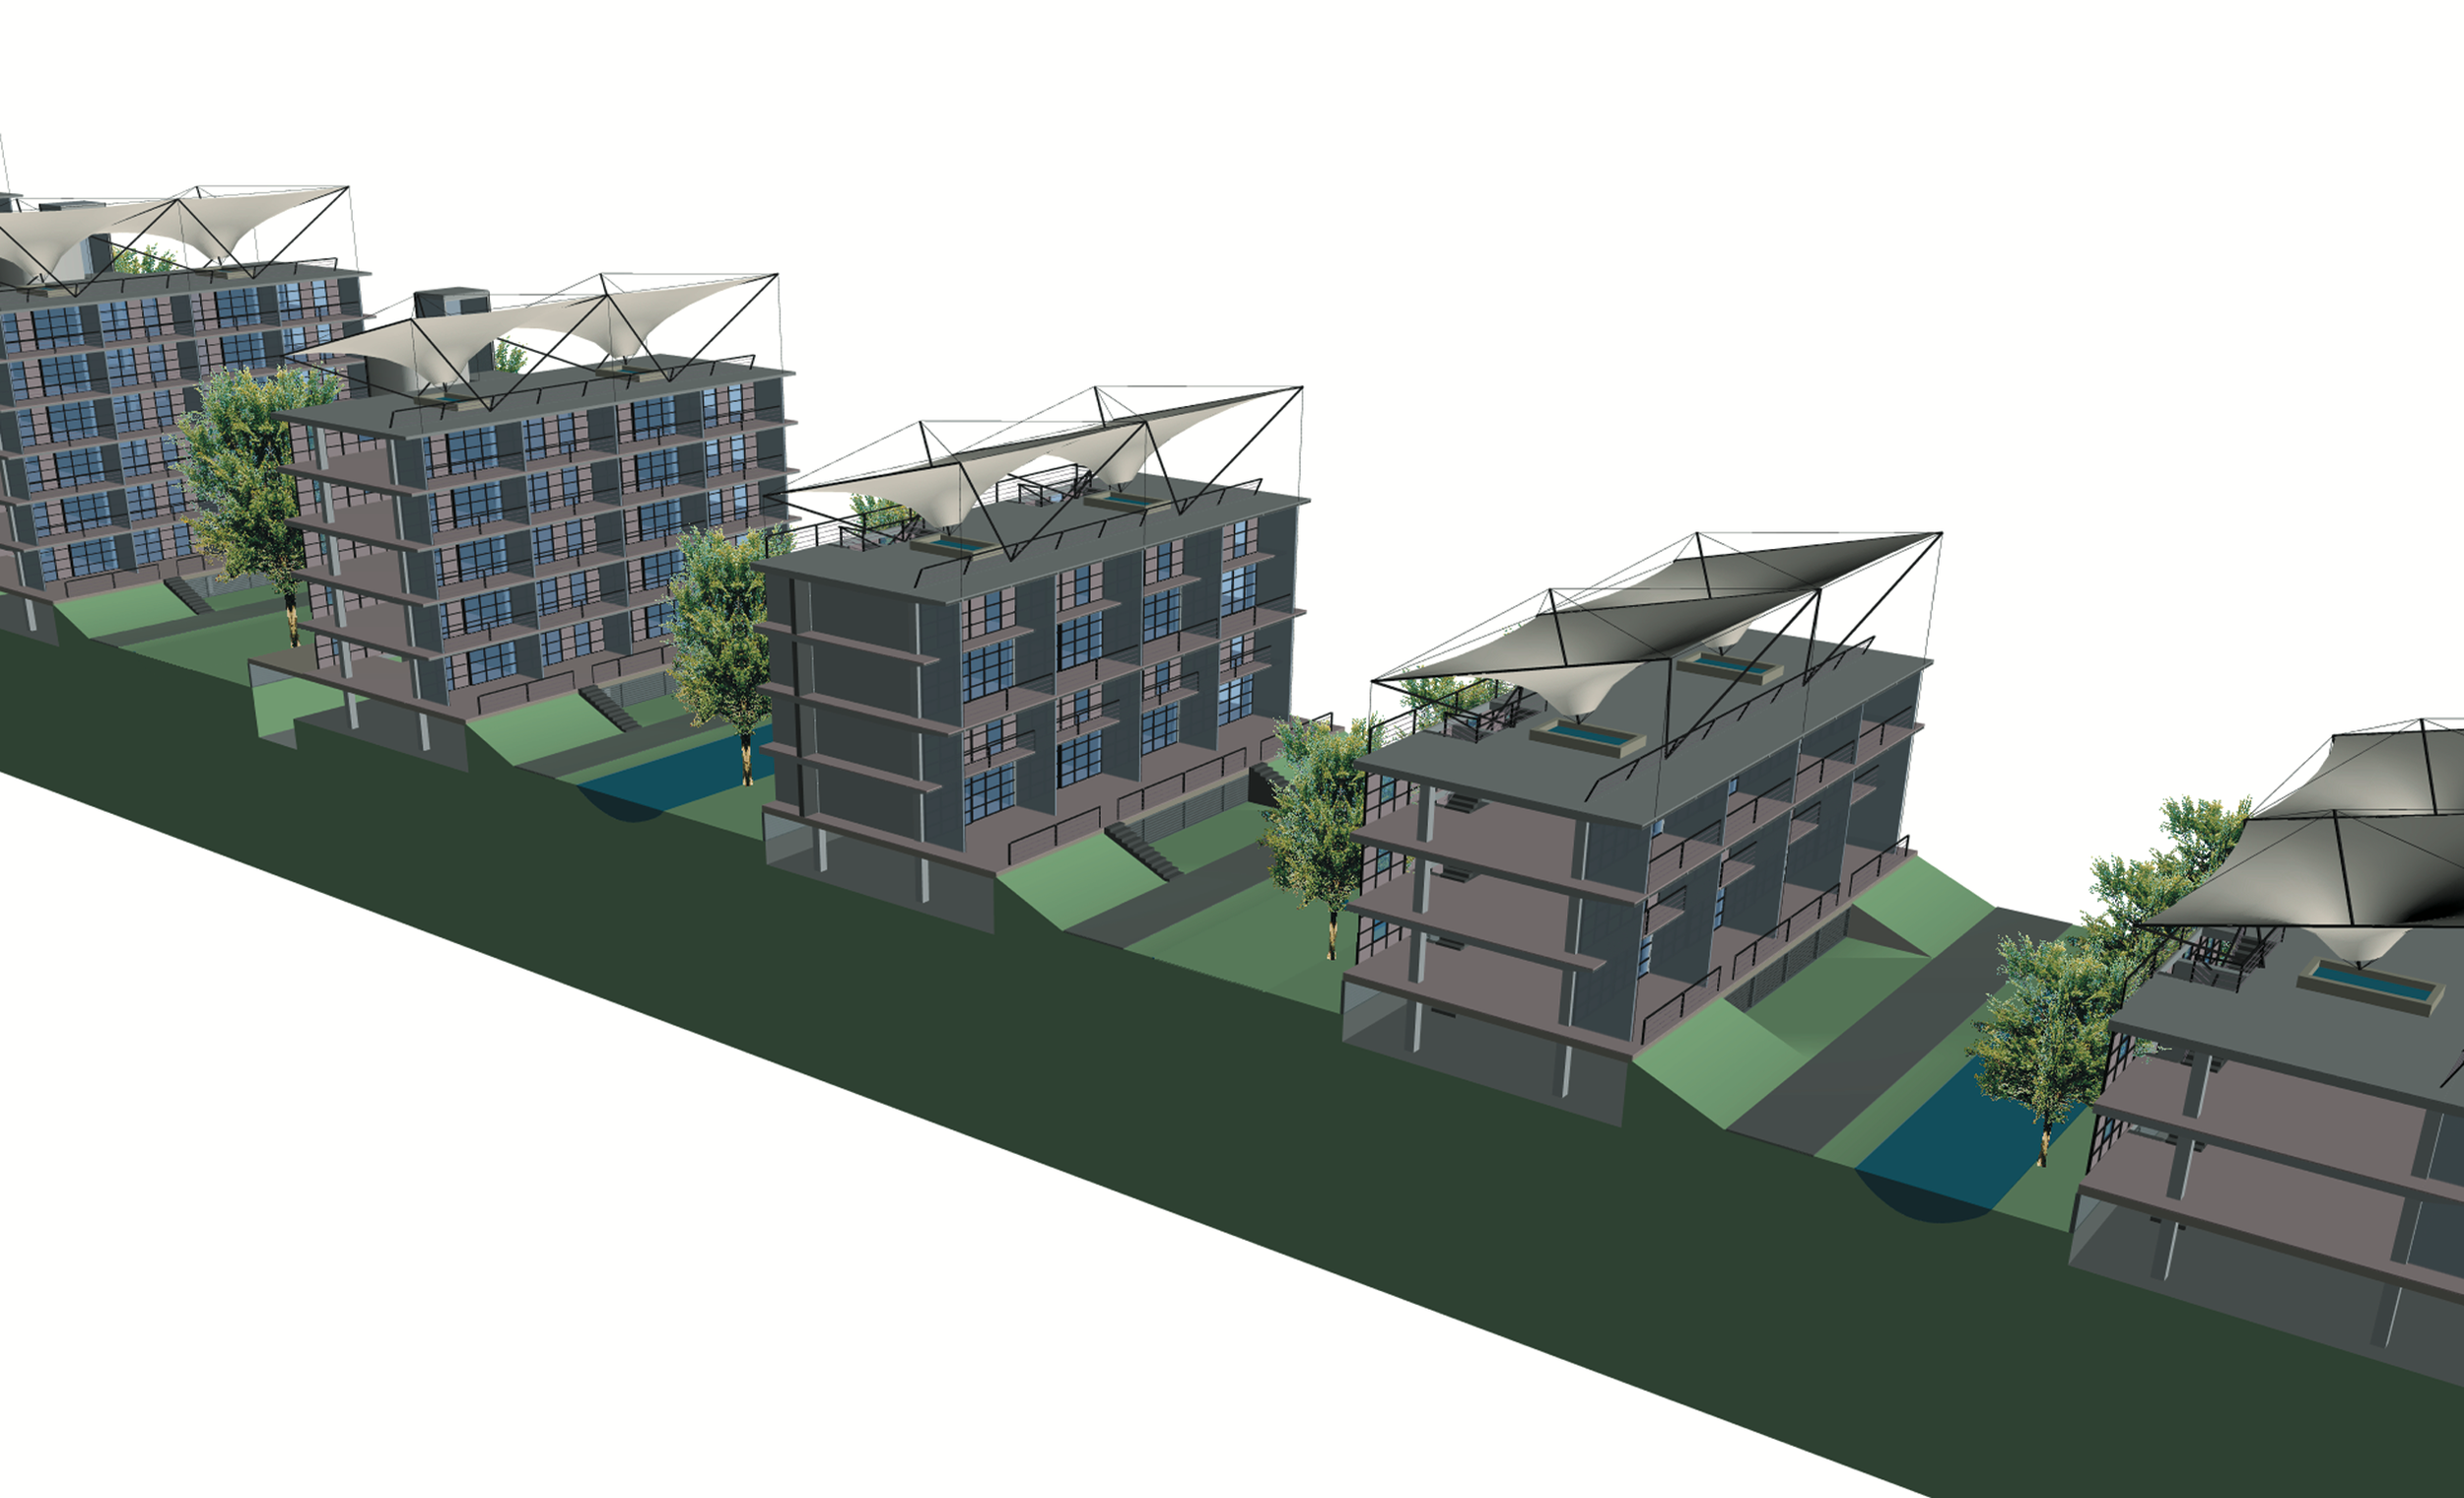 Climate Responsive Building Design | Shanghai 2000